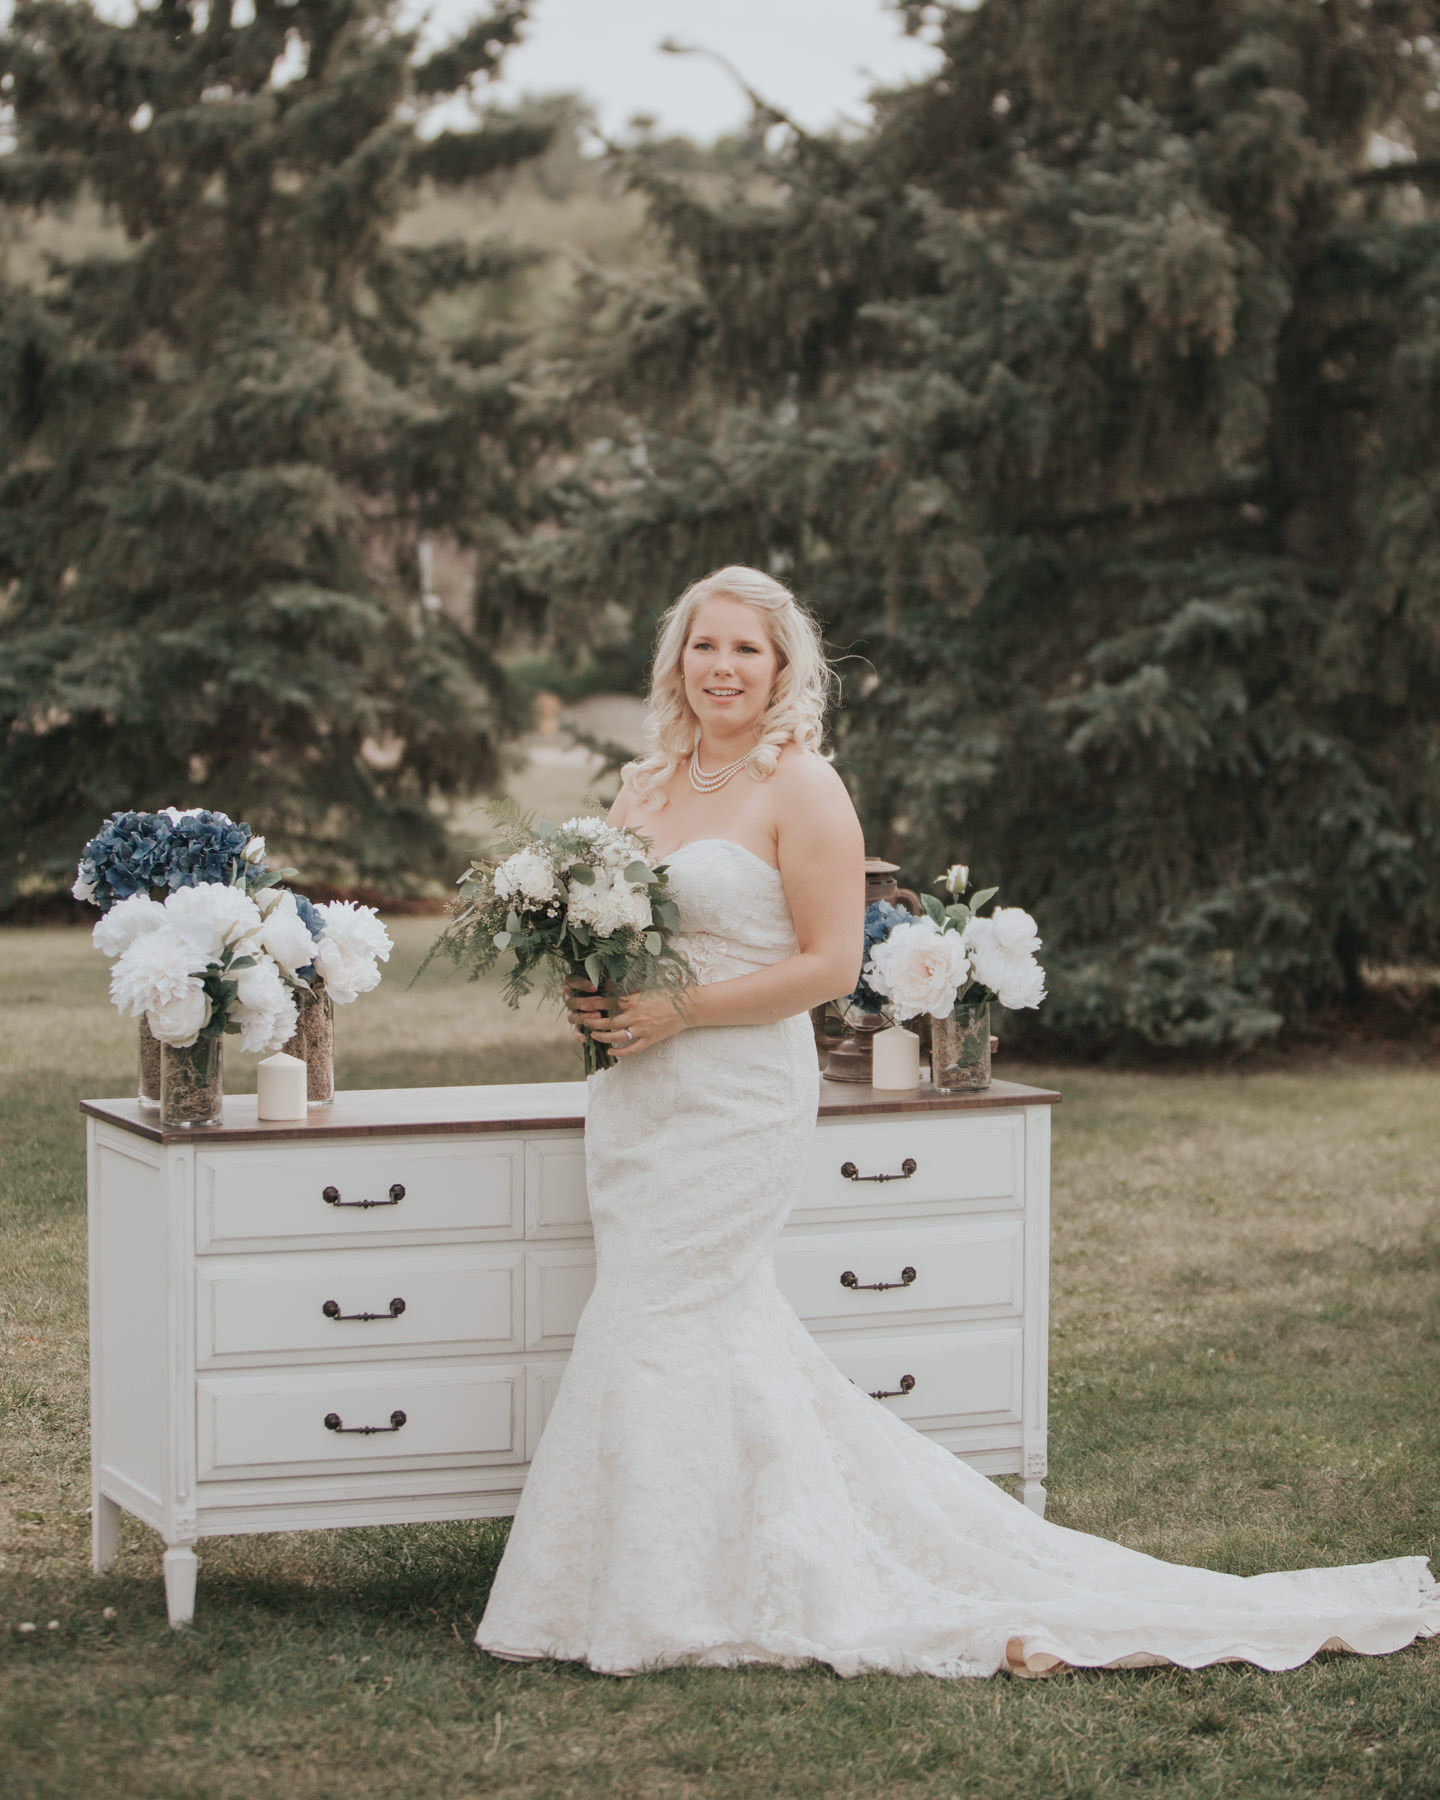 Vancouver wedding photographer Jess 26